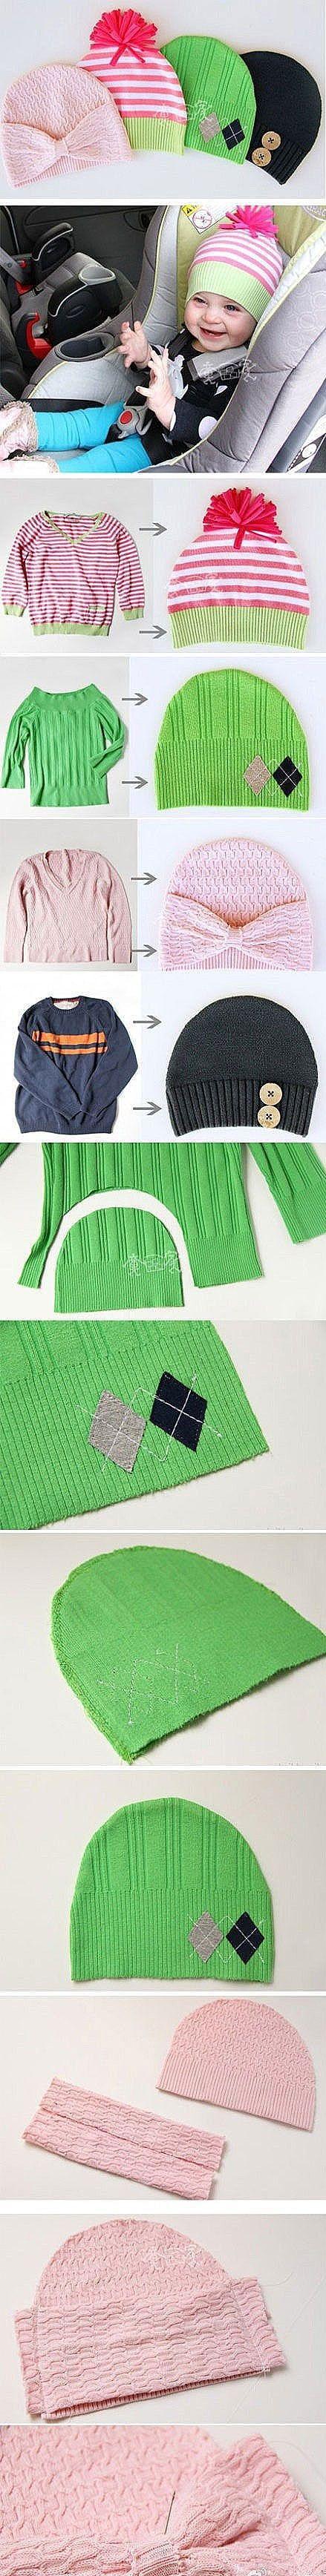 Симпатичная вязанная шапка / Easy way to make a DIY crochet hat